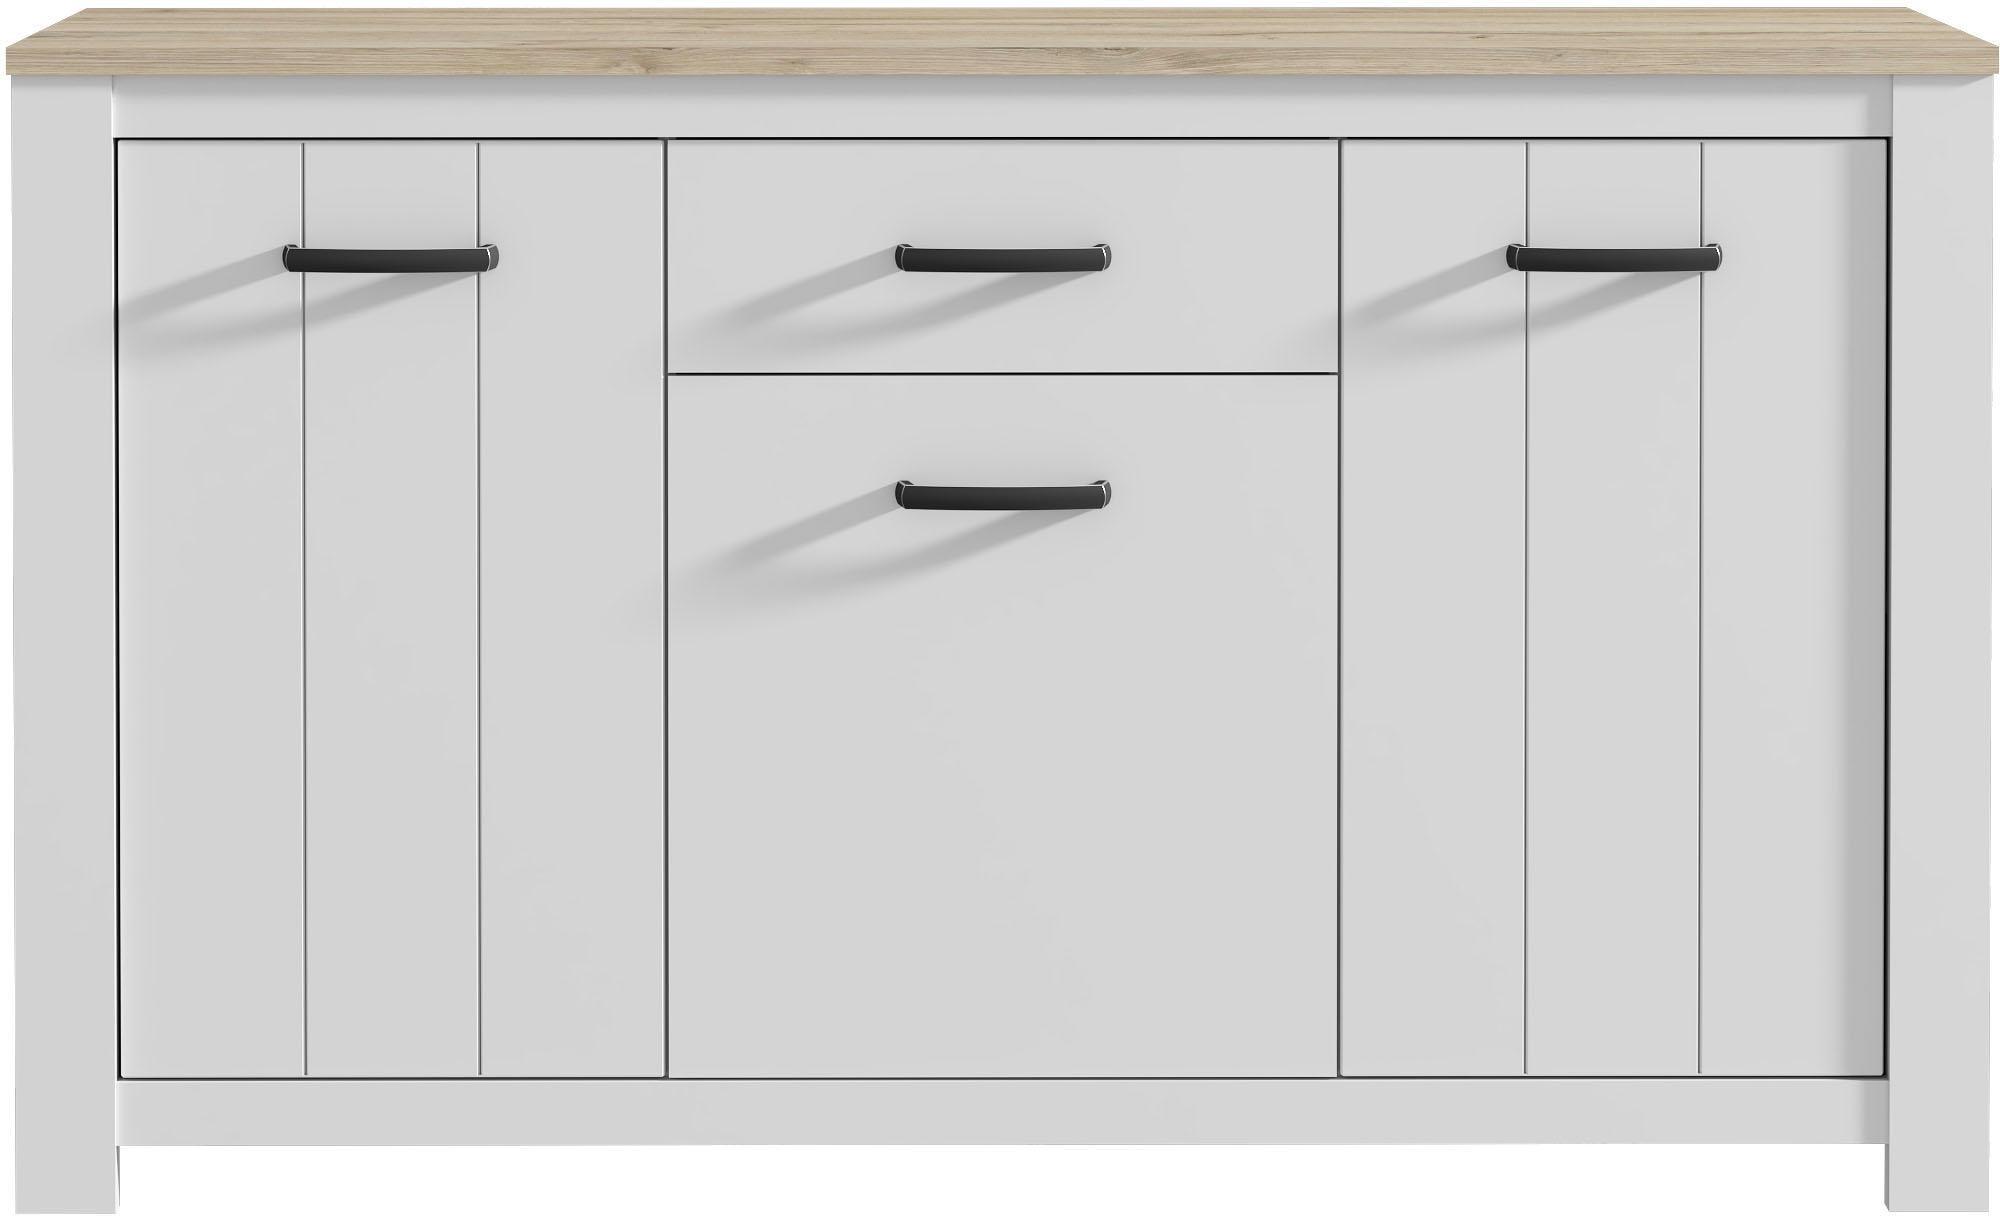 FORTE Sideboard Breite 161 4 cm